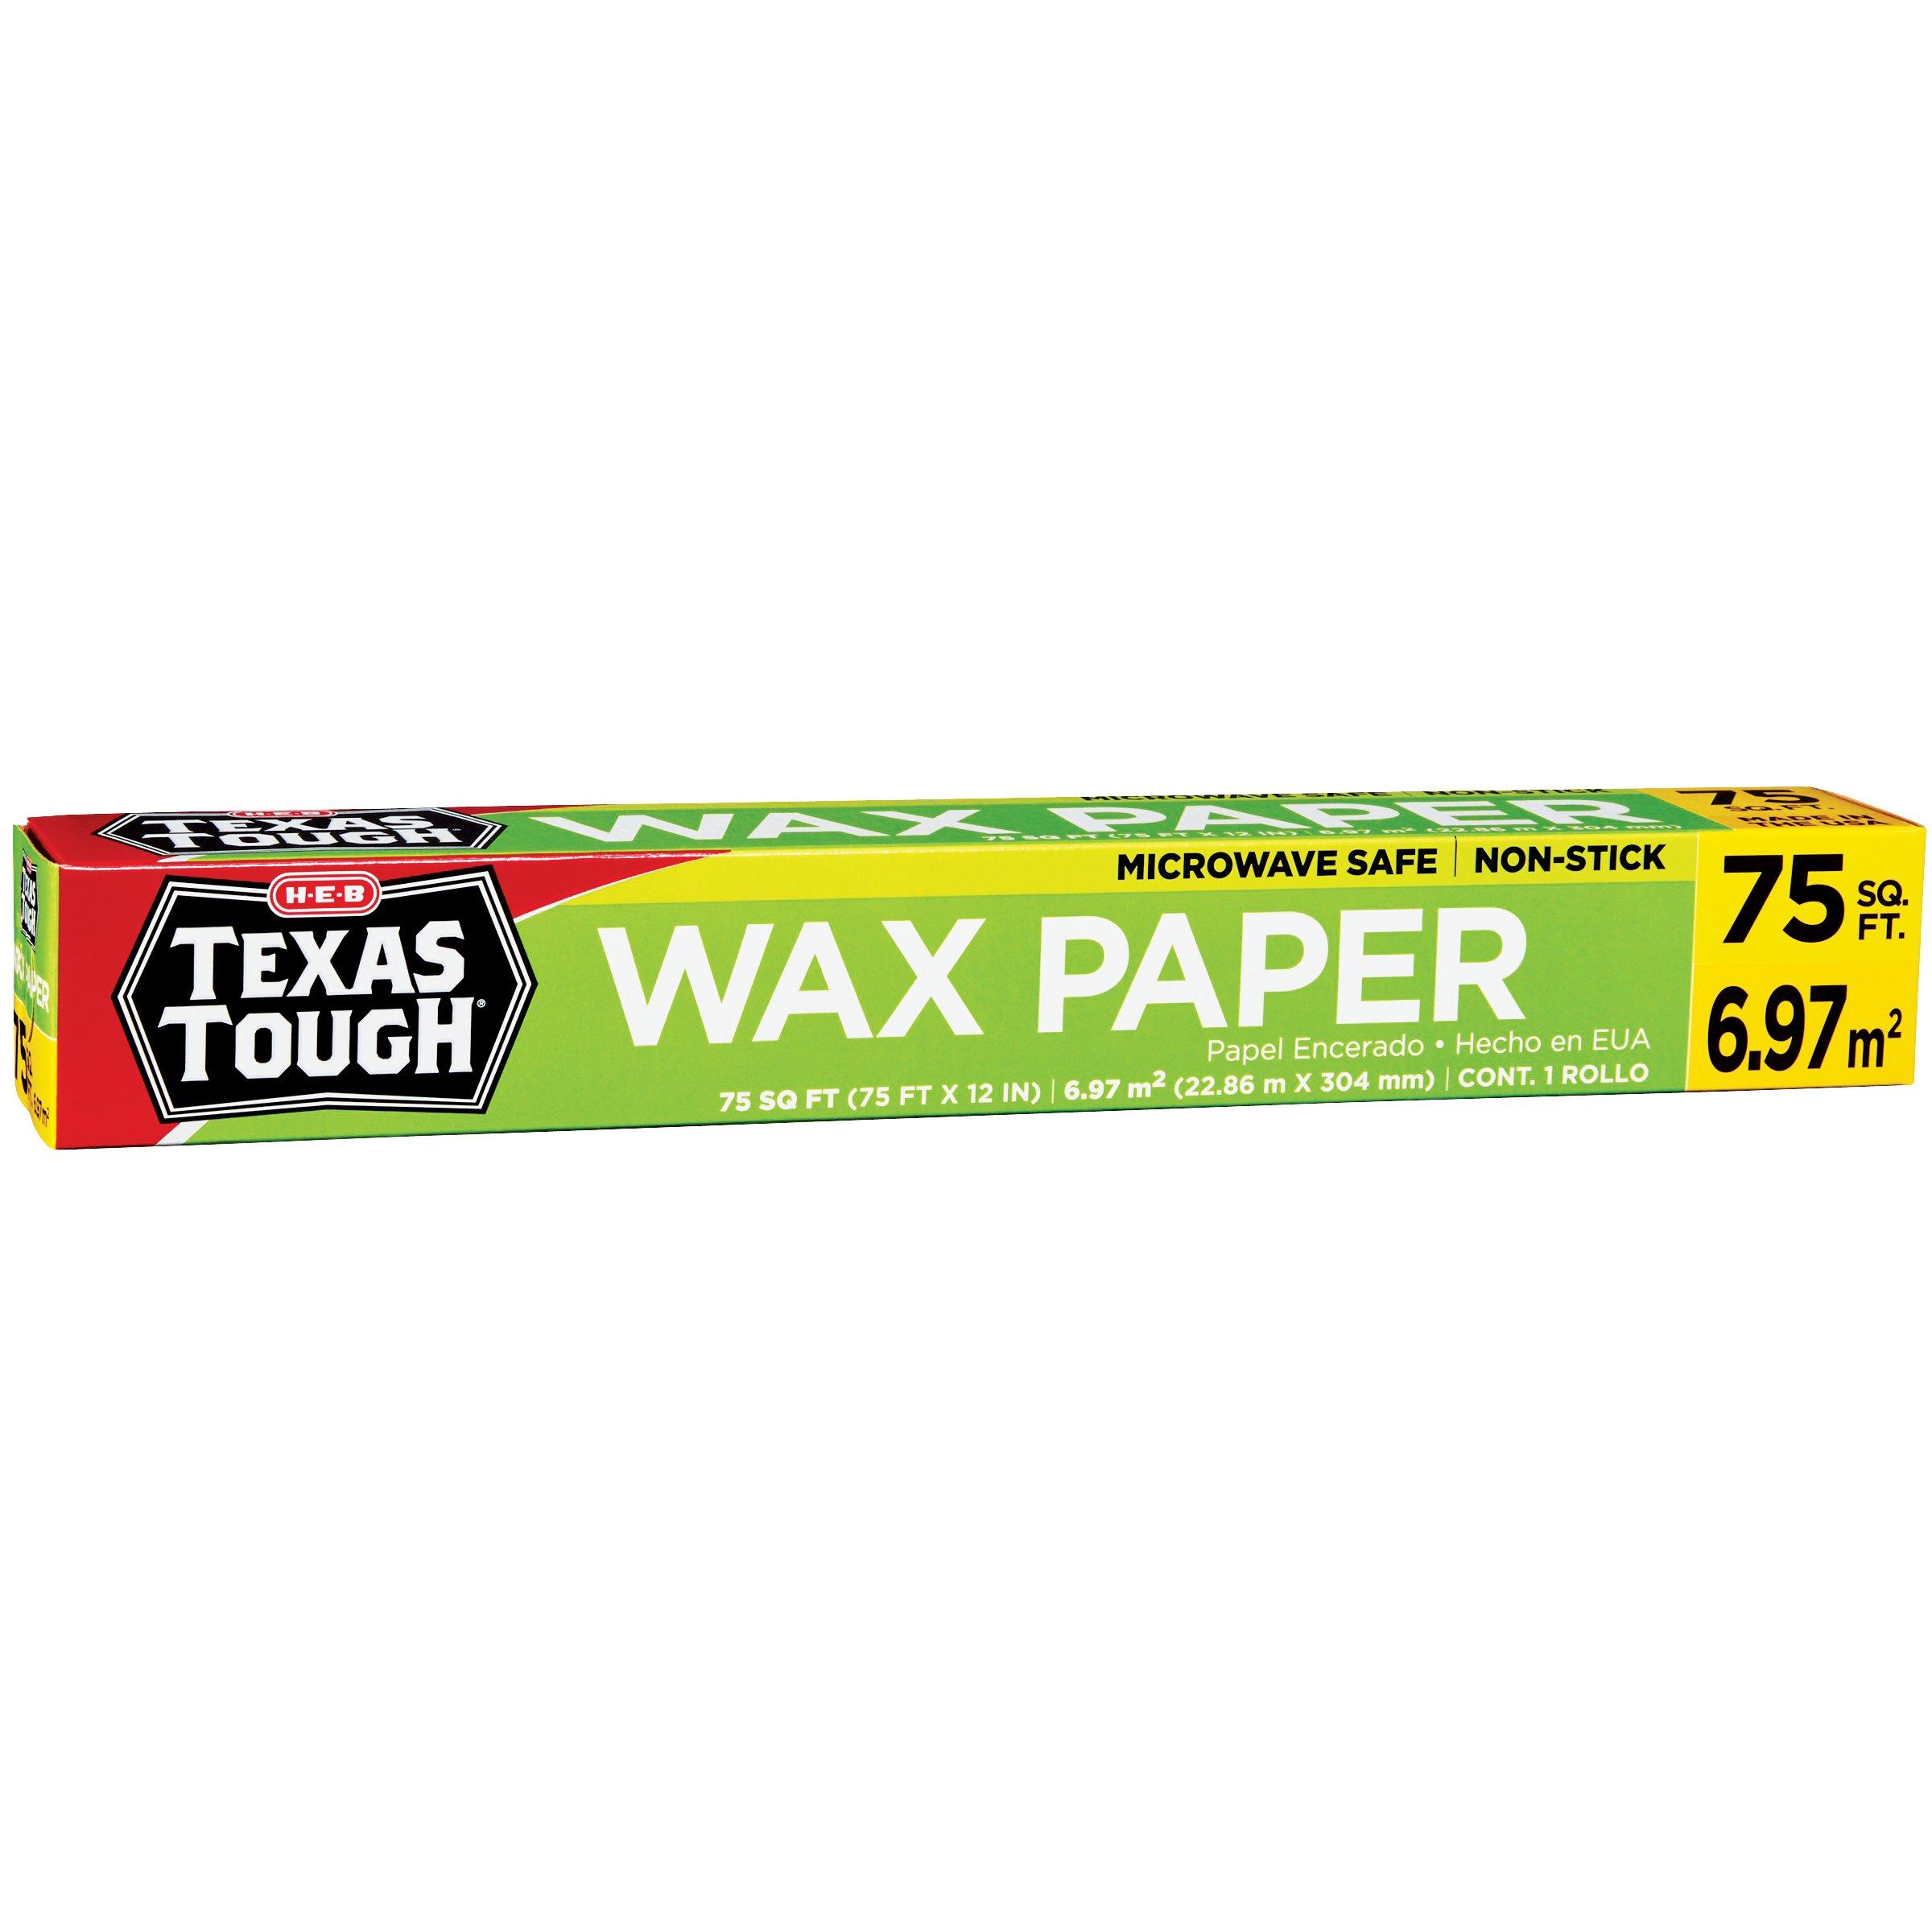 H-E-B Texas Tough Wax Paper - Shop Foil & Plastic Wrap at ...